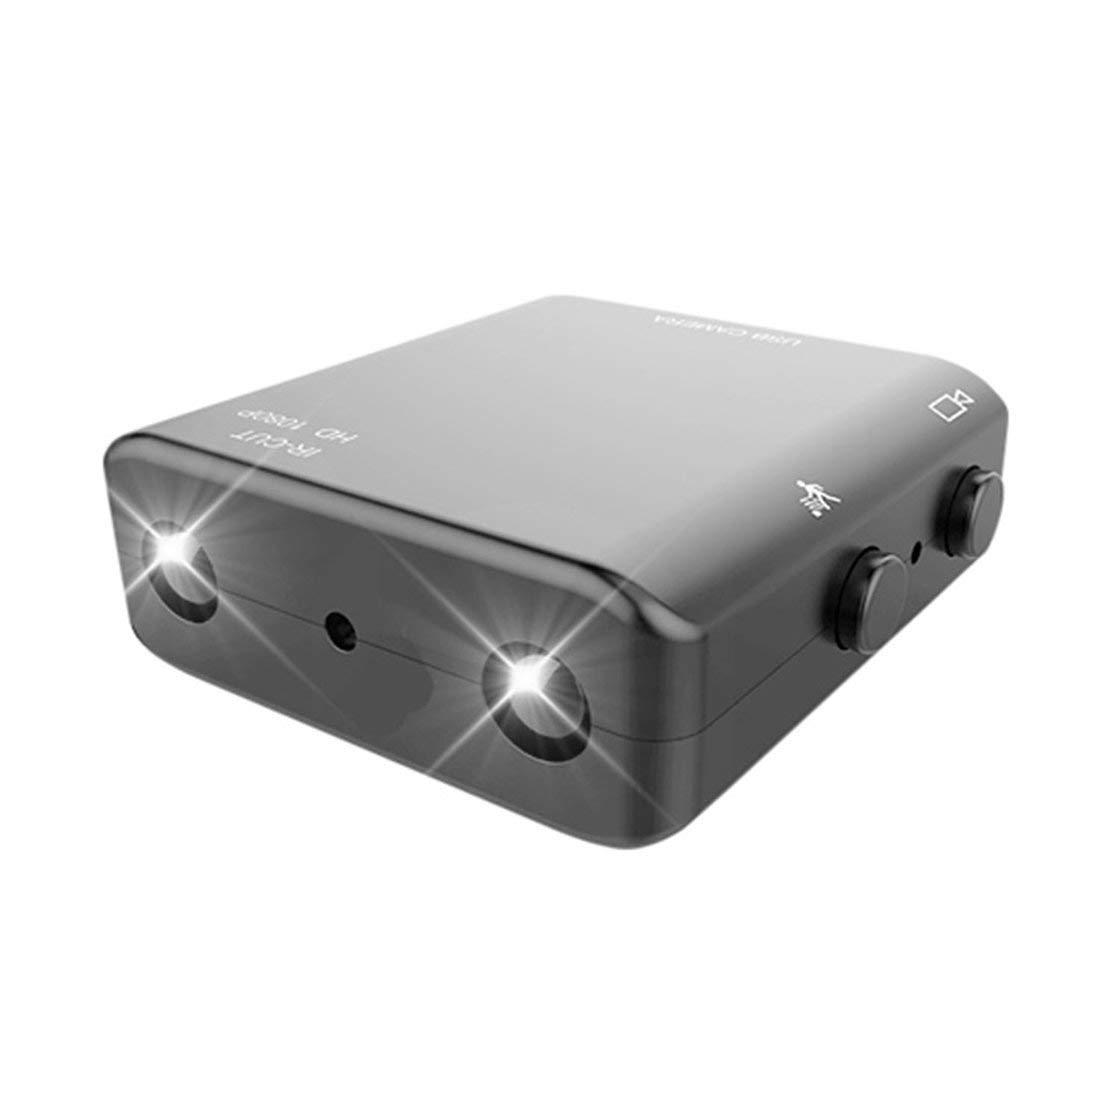 Alte Wagenräder Dekorieren Inspirierend southern Emedia Product Bug Rf Detectorzeerkeer